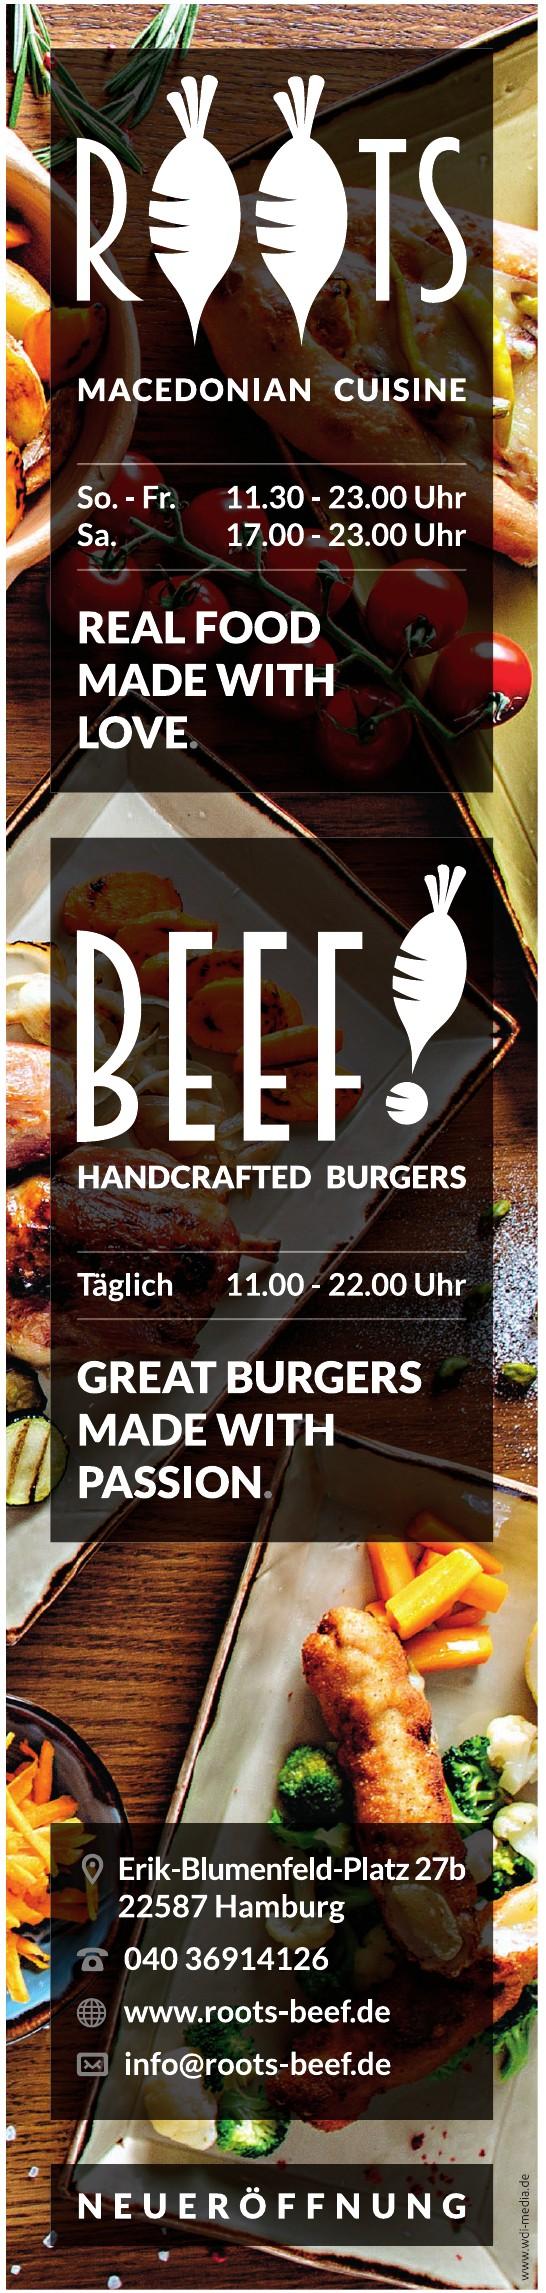 Roots & Beef